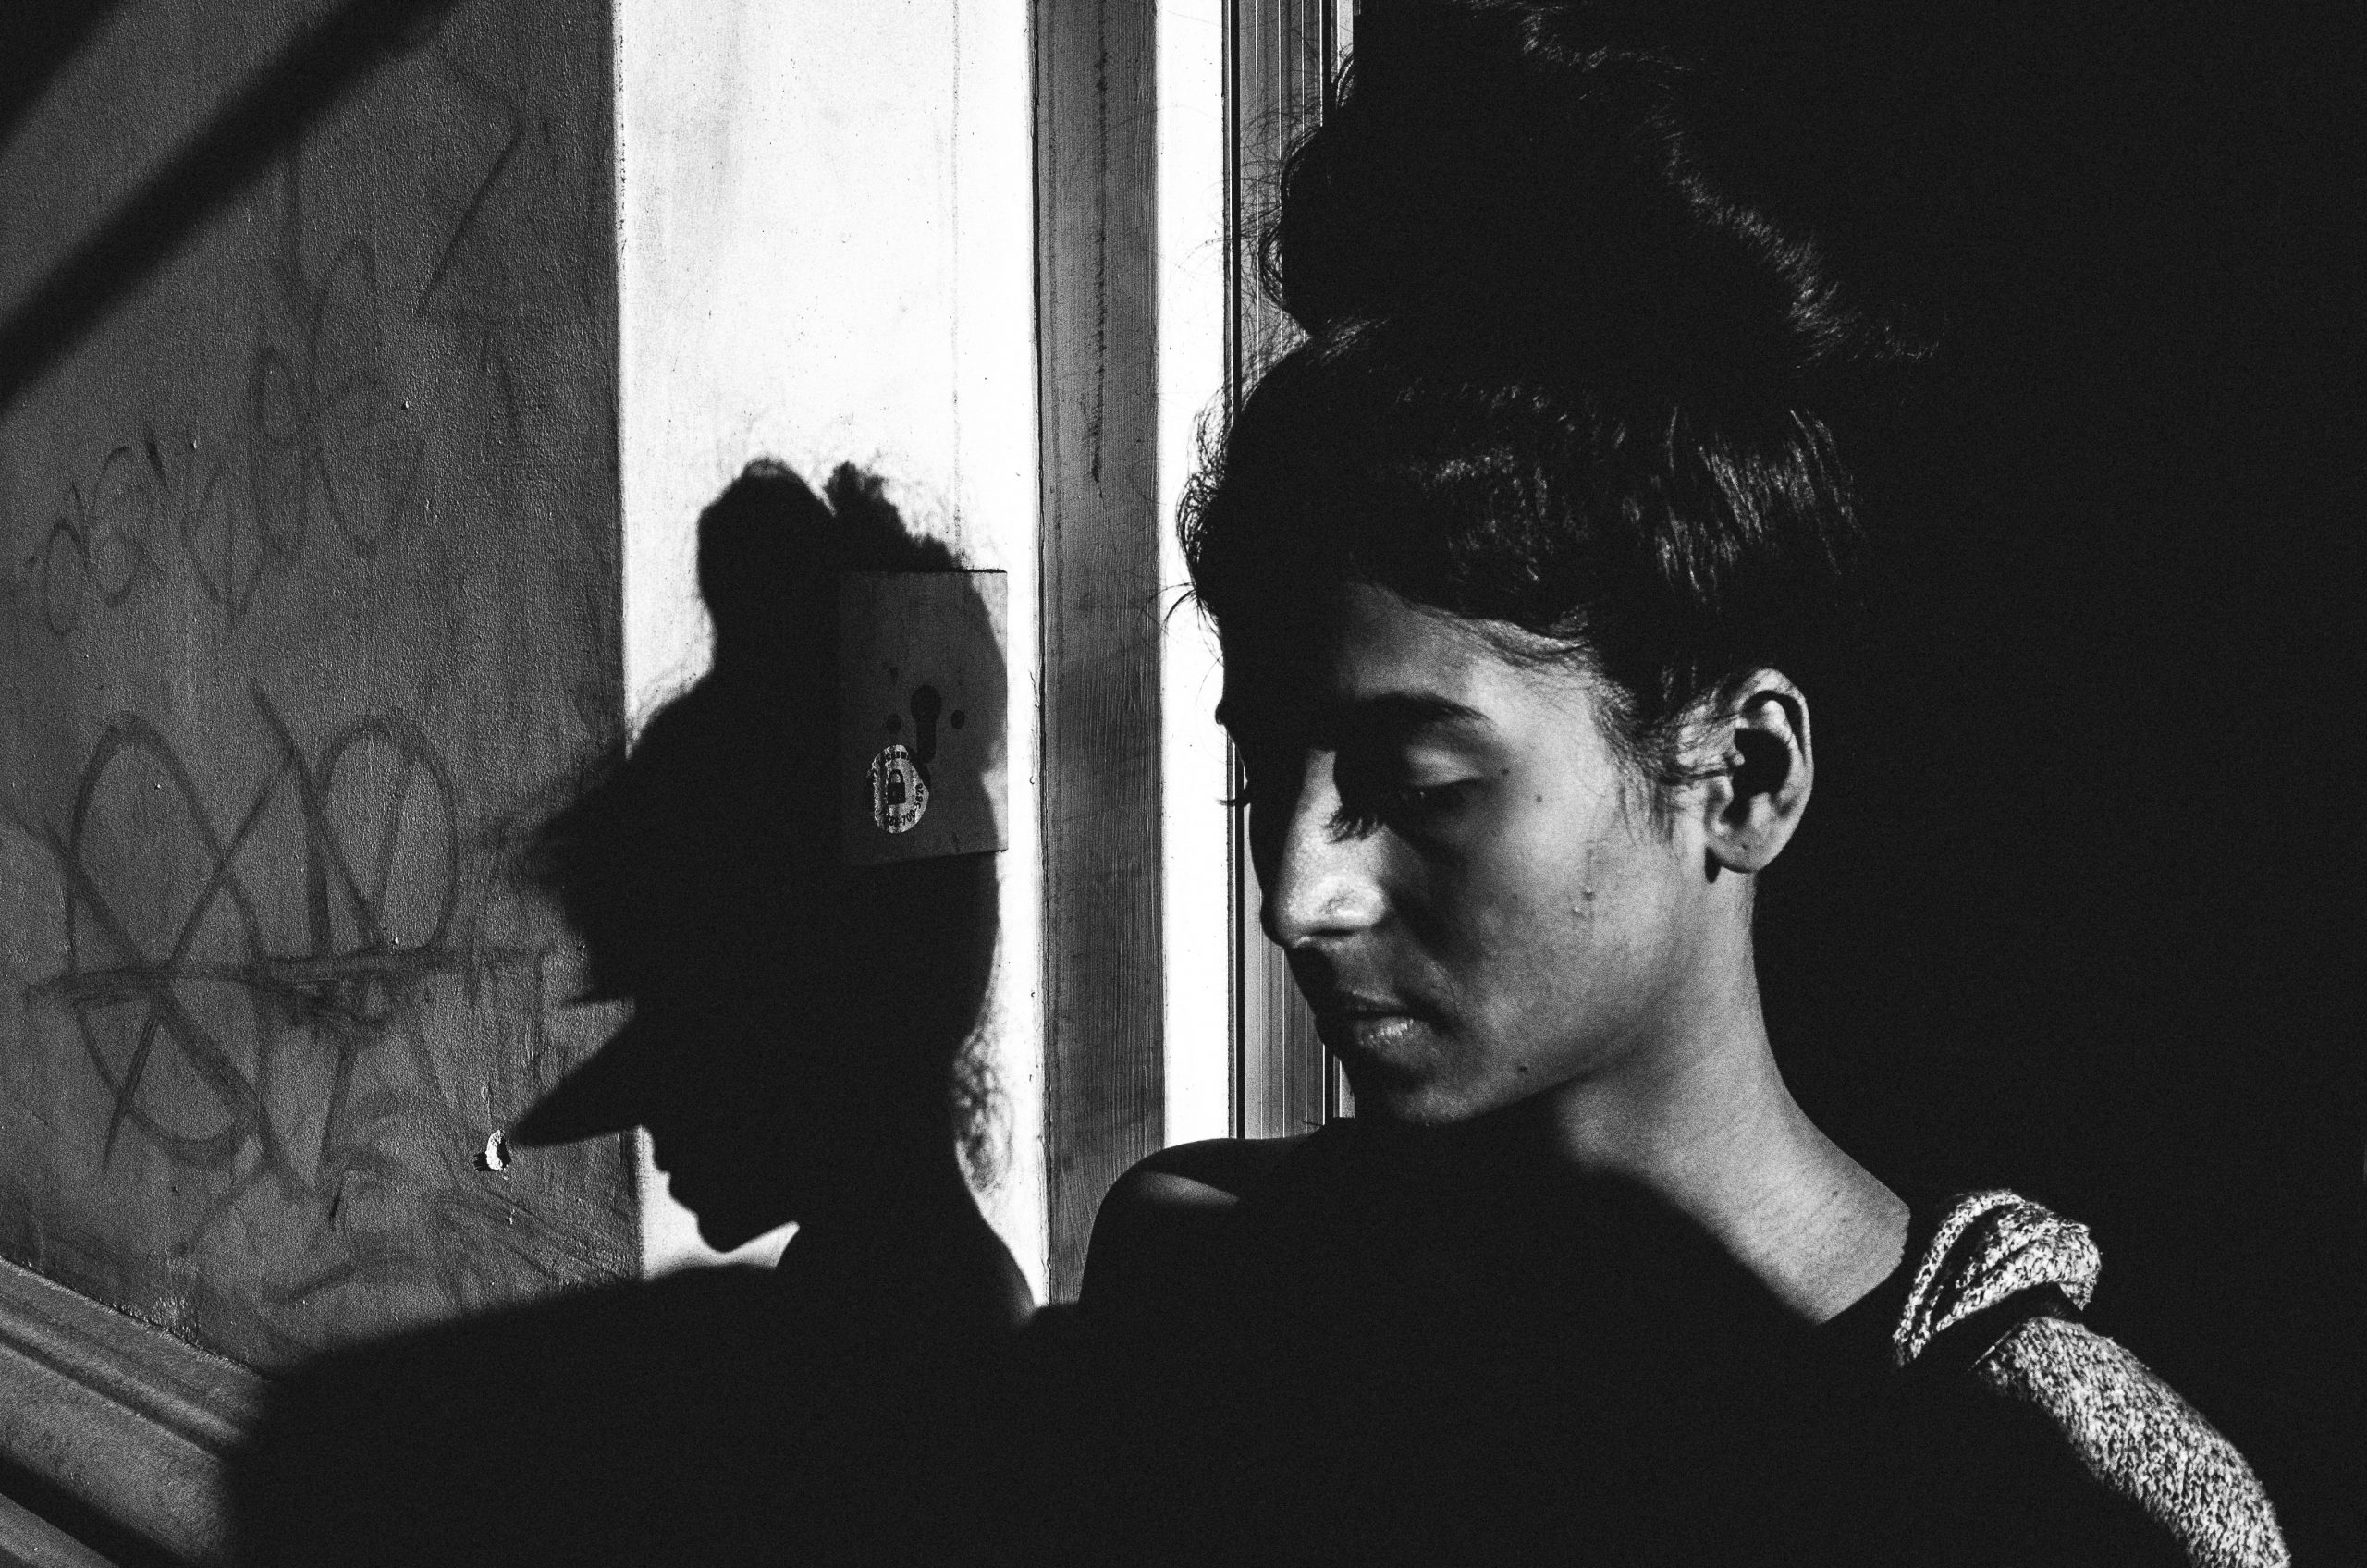 Pinnochio nose surreal eric kim Street photography black and white